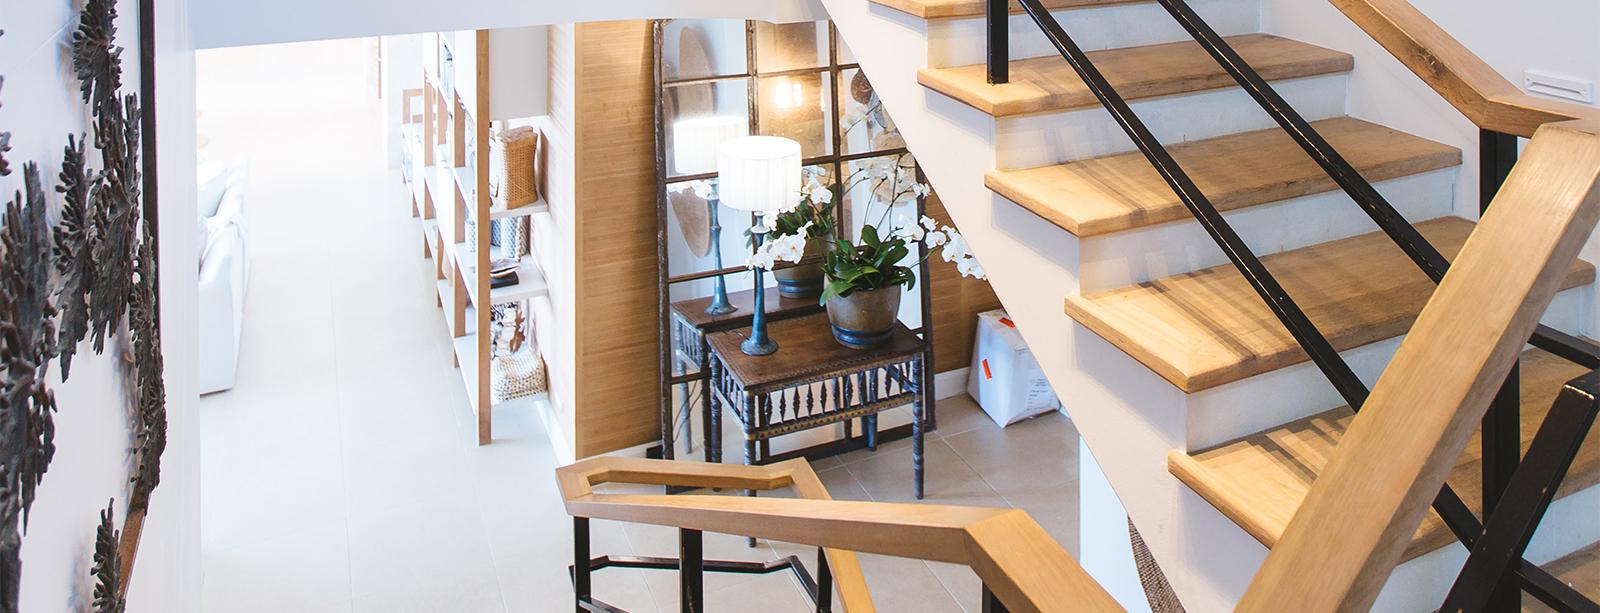 multi level wood stairway in luxury home